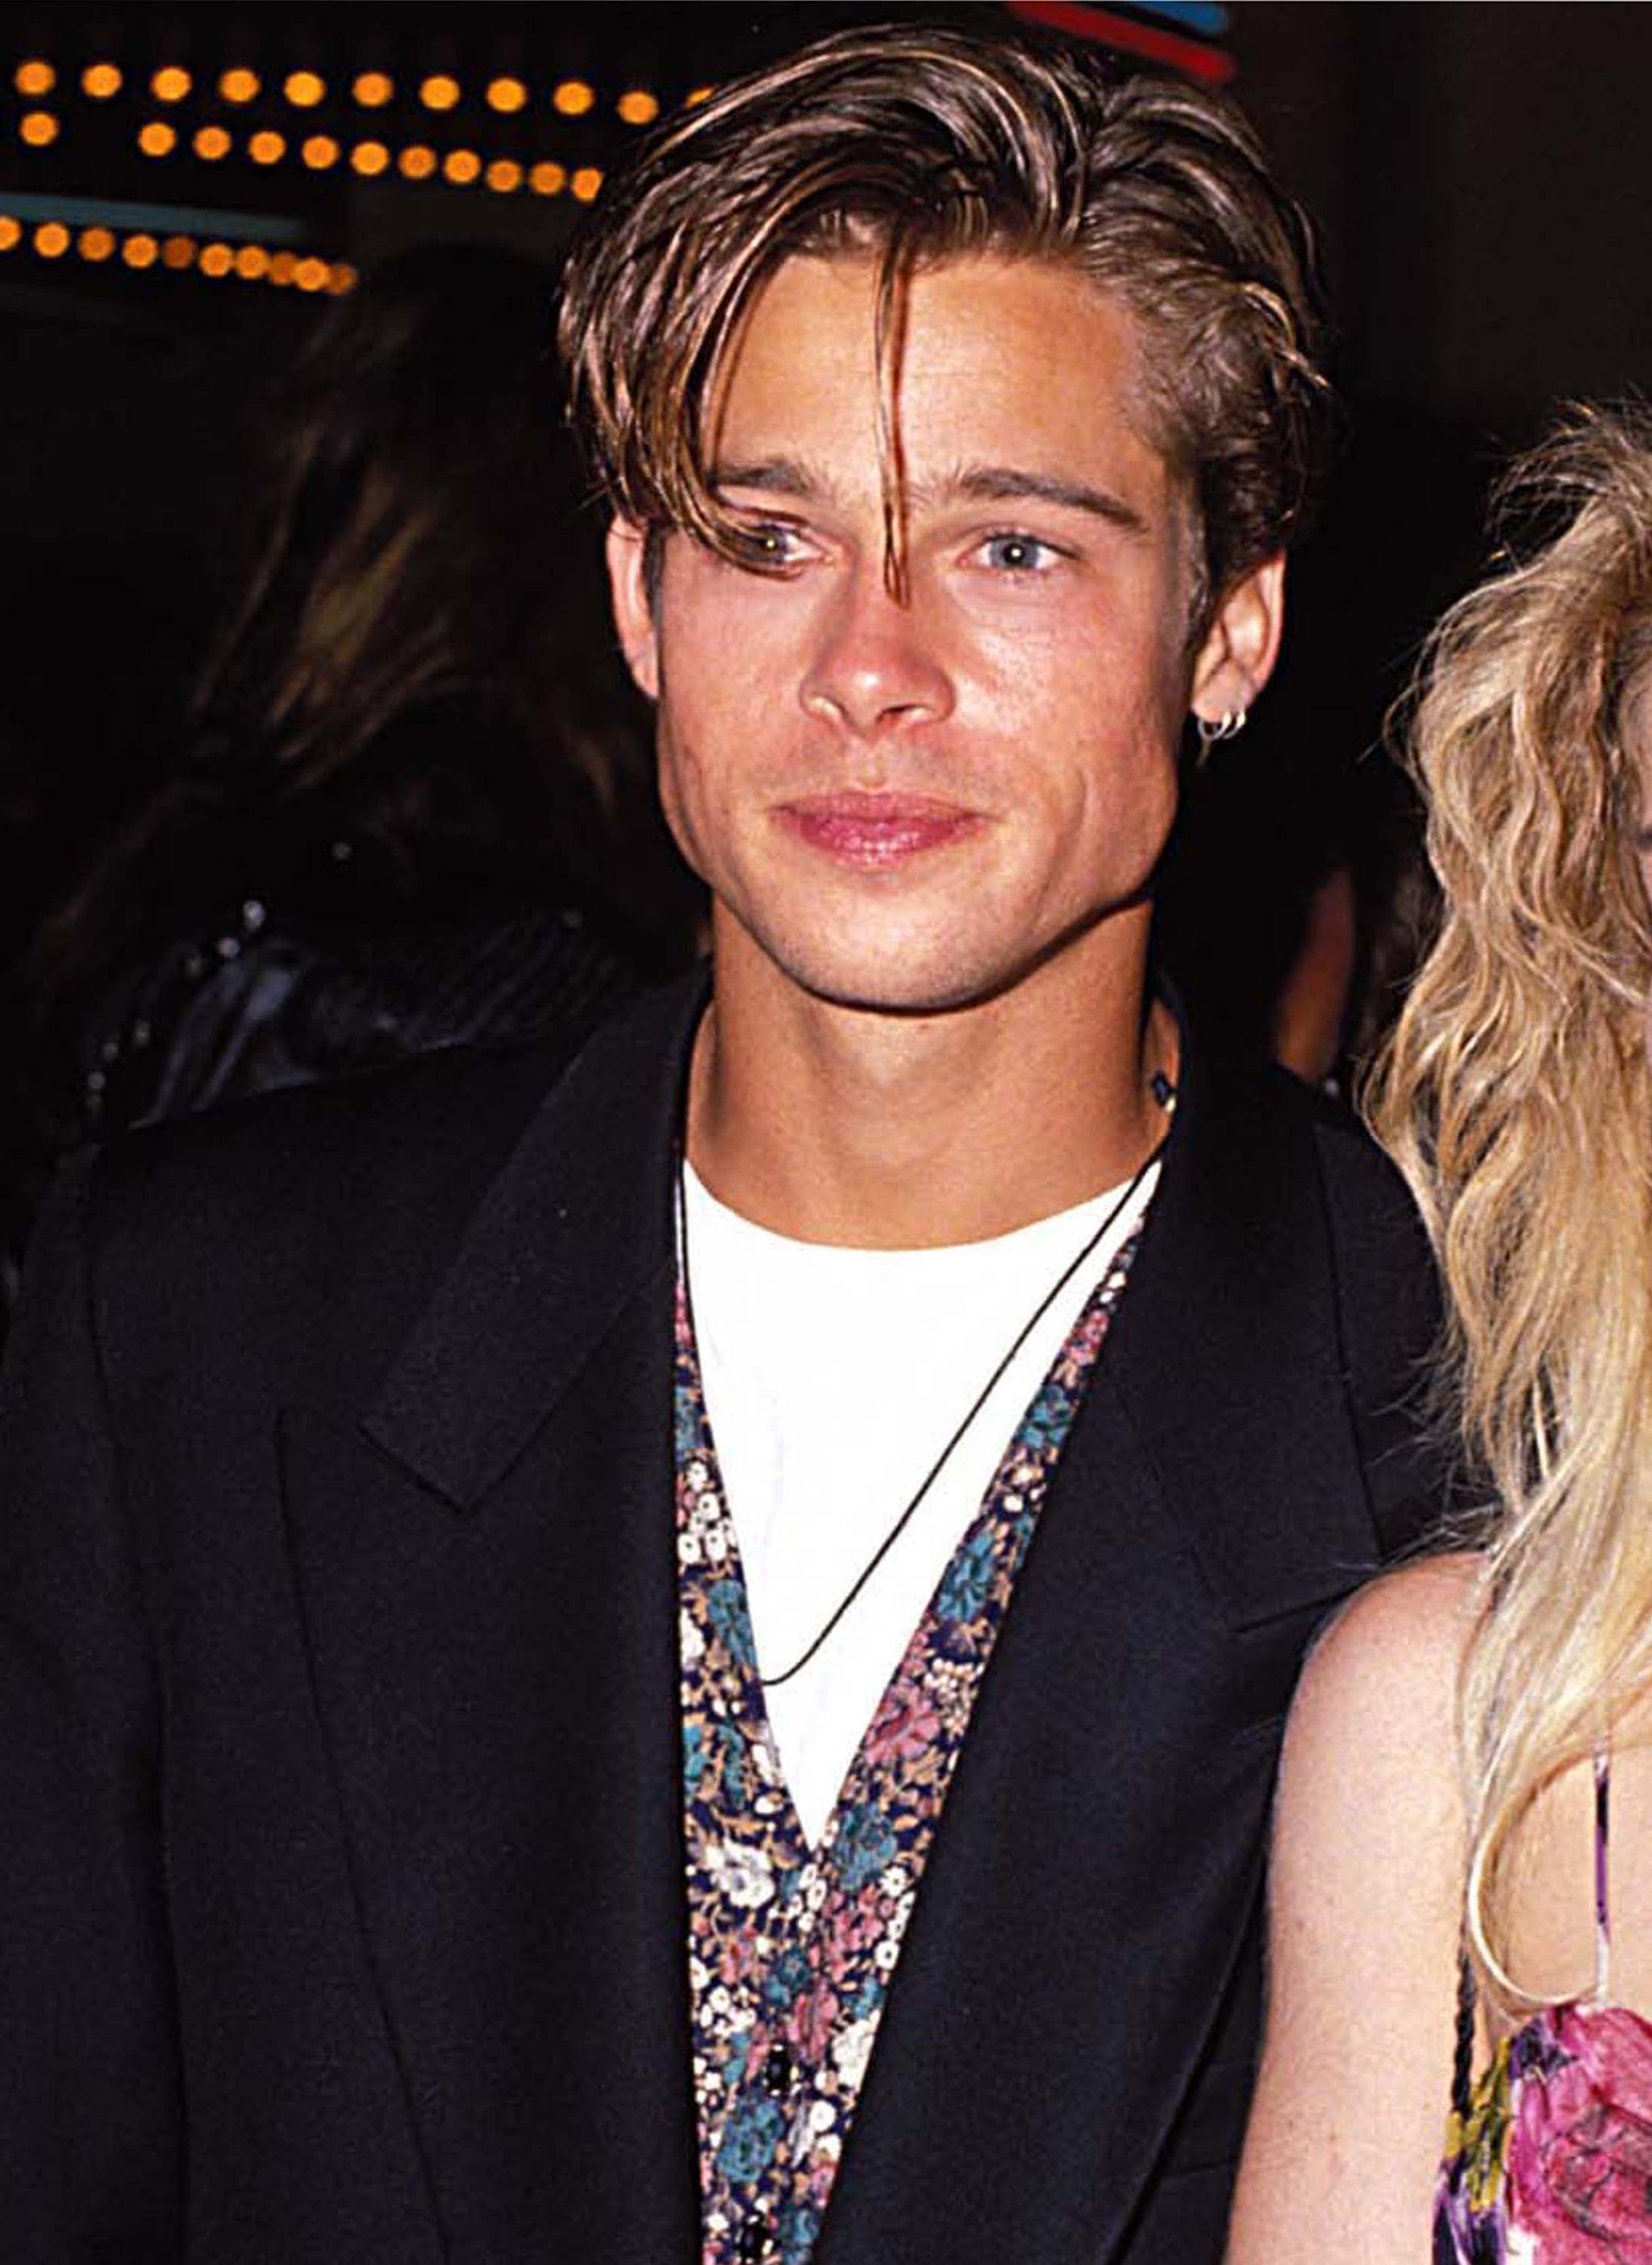 September 1990: The Bad Boy Tousle